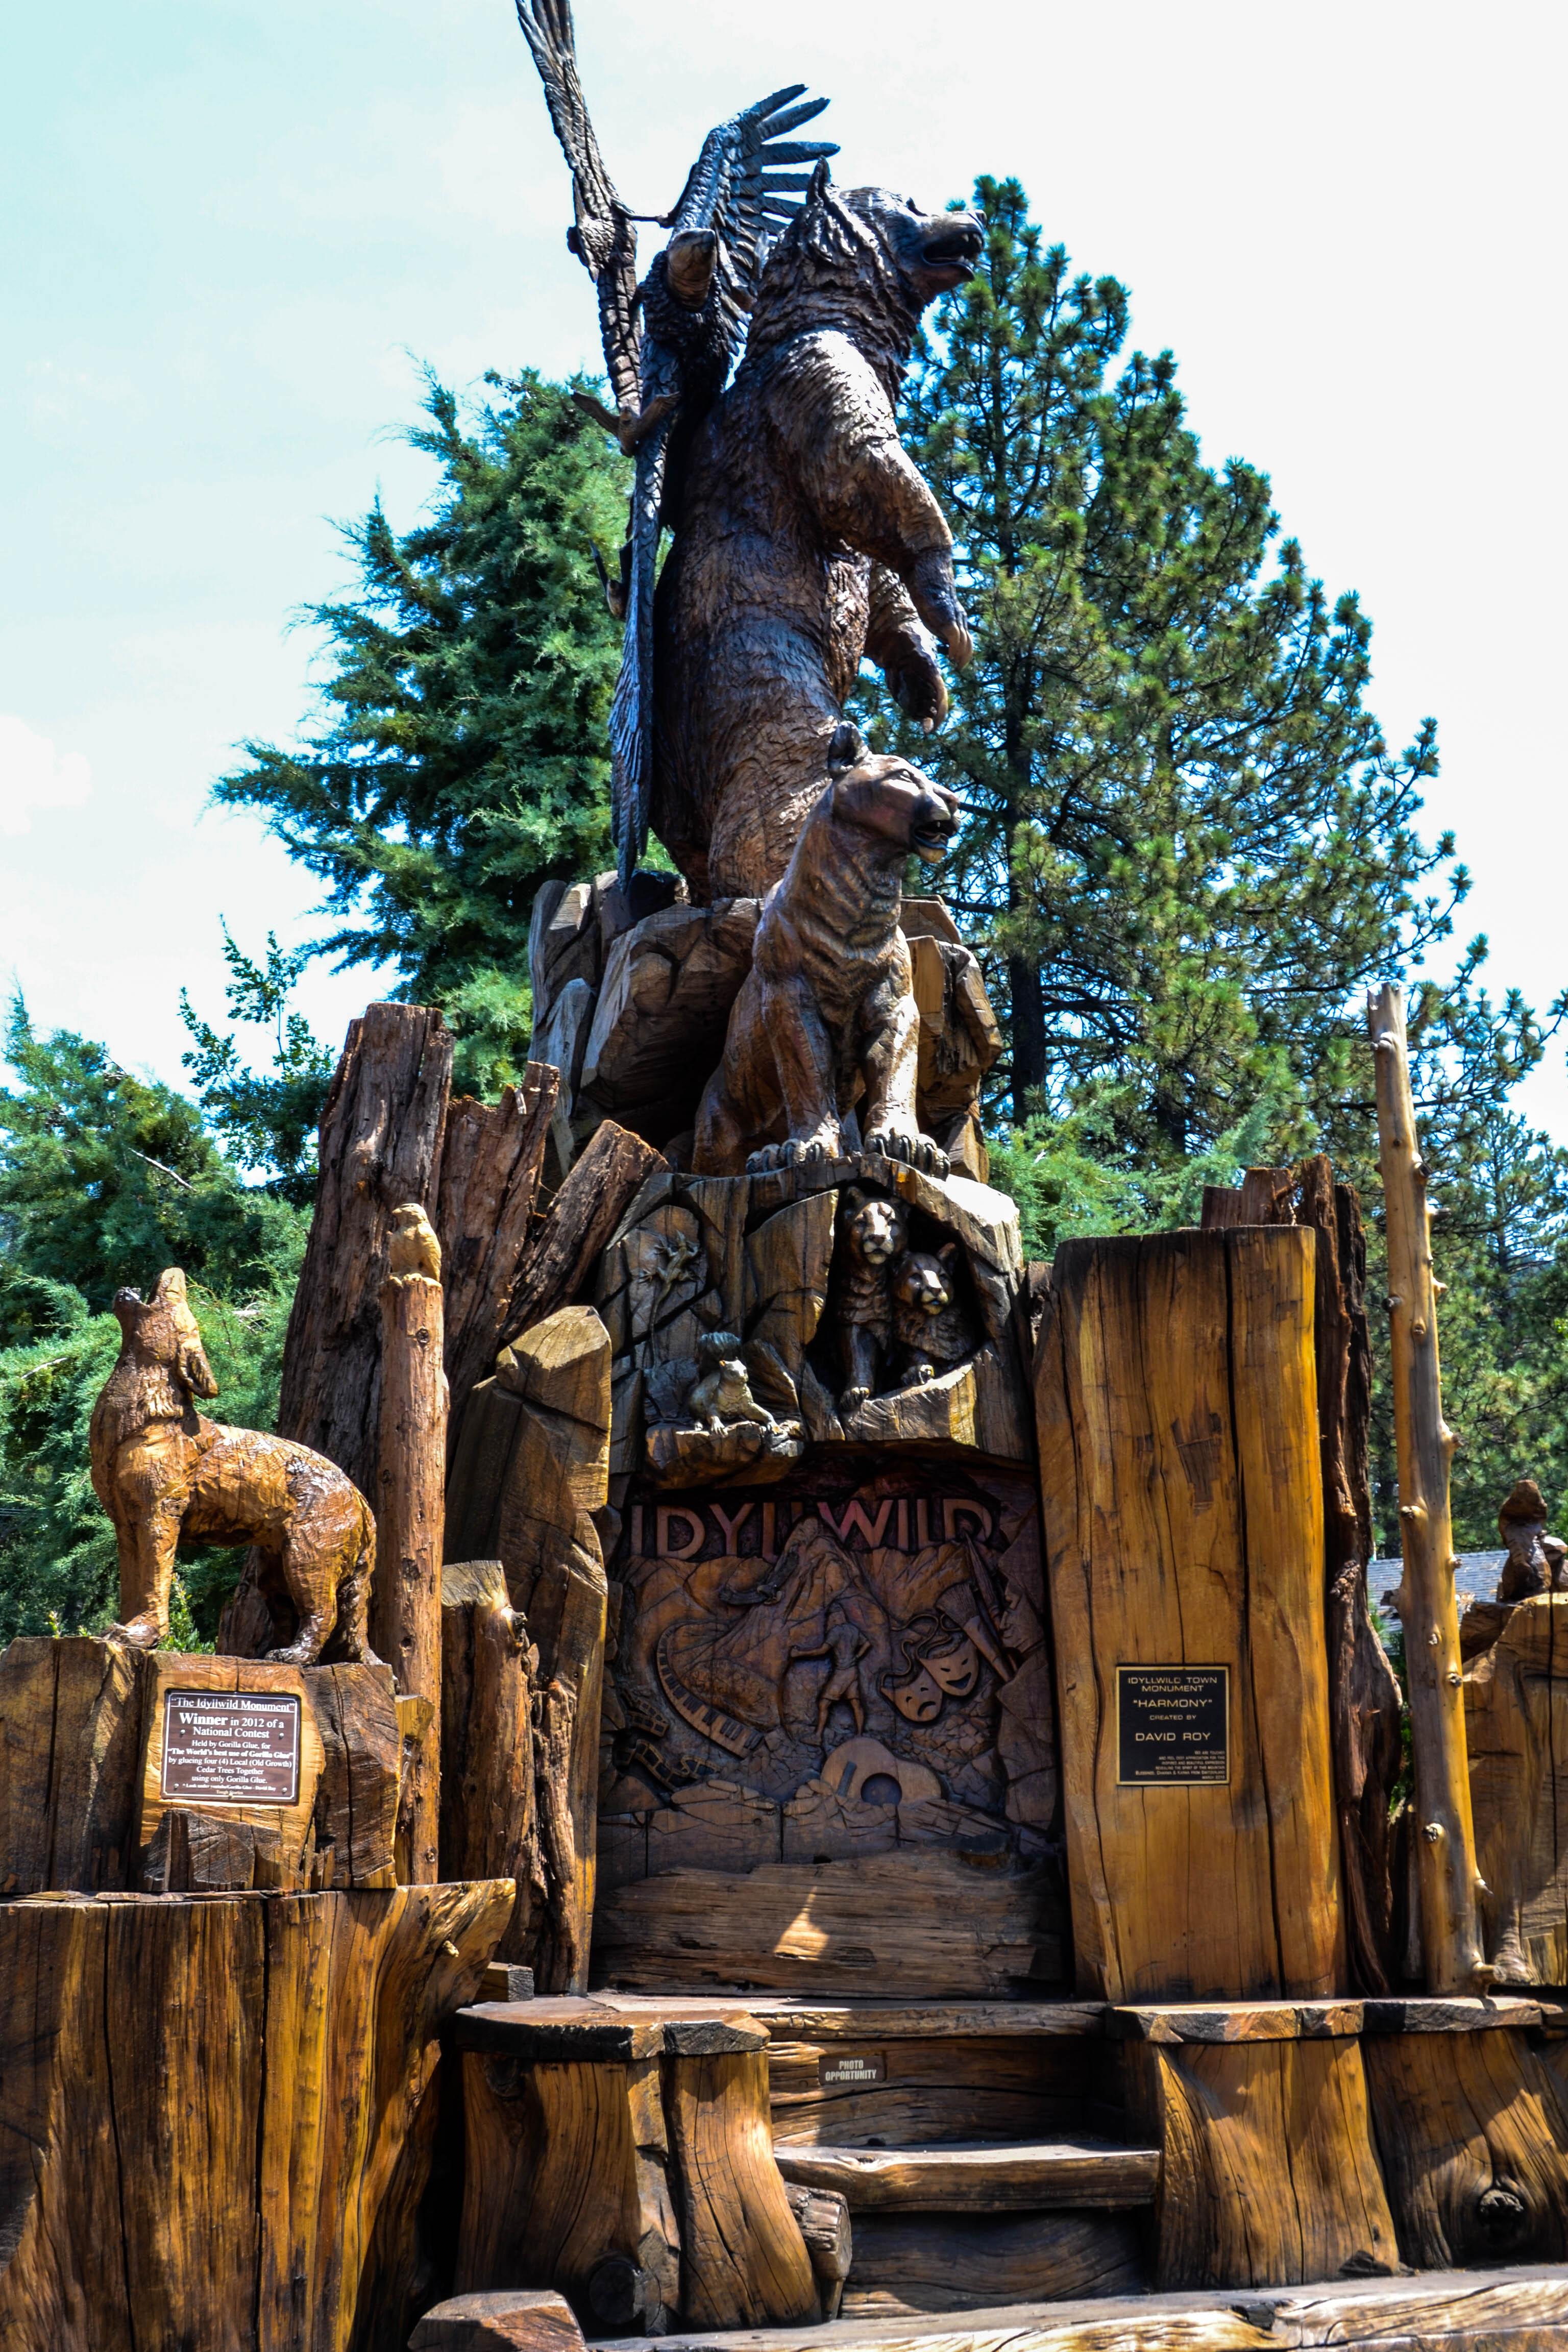 Idyllwild town monument